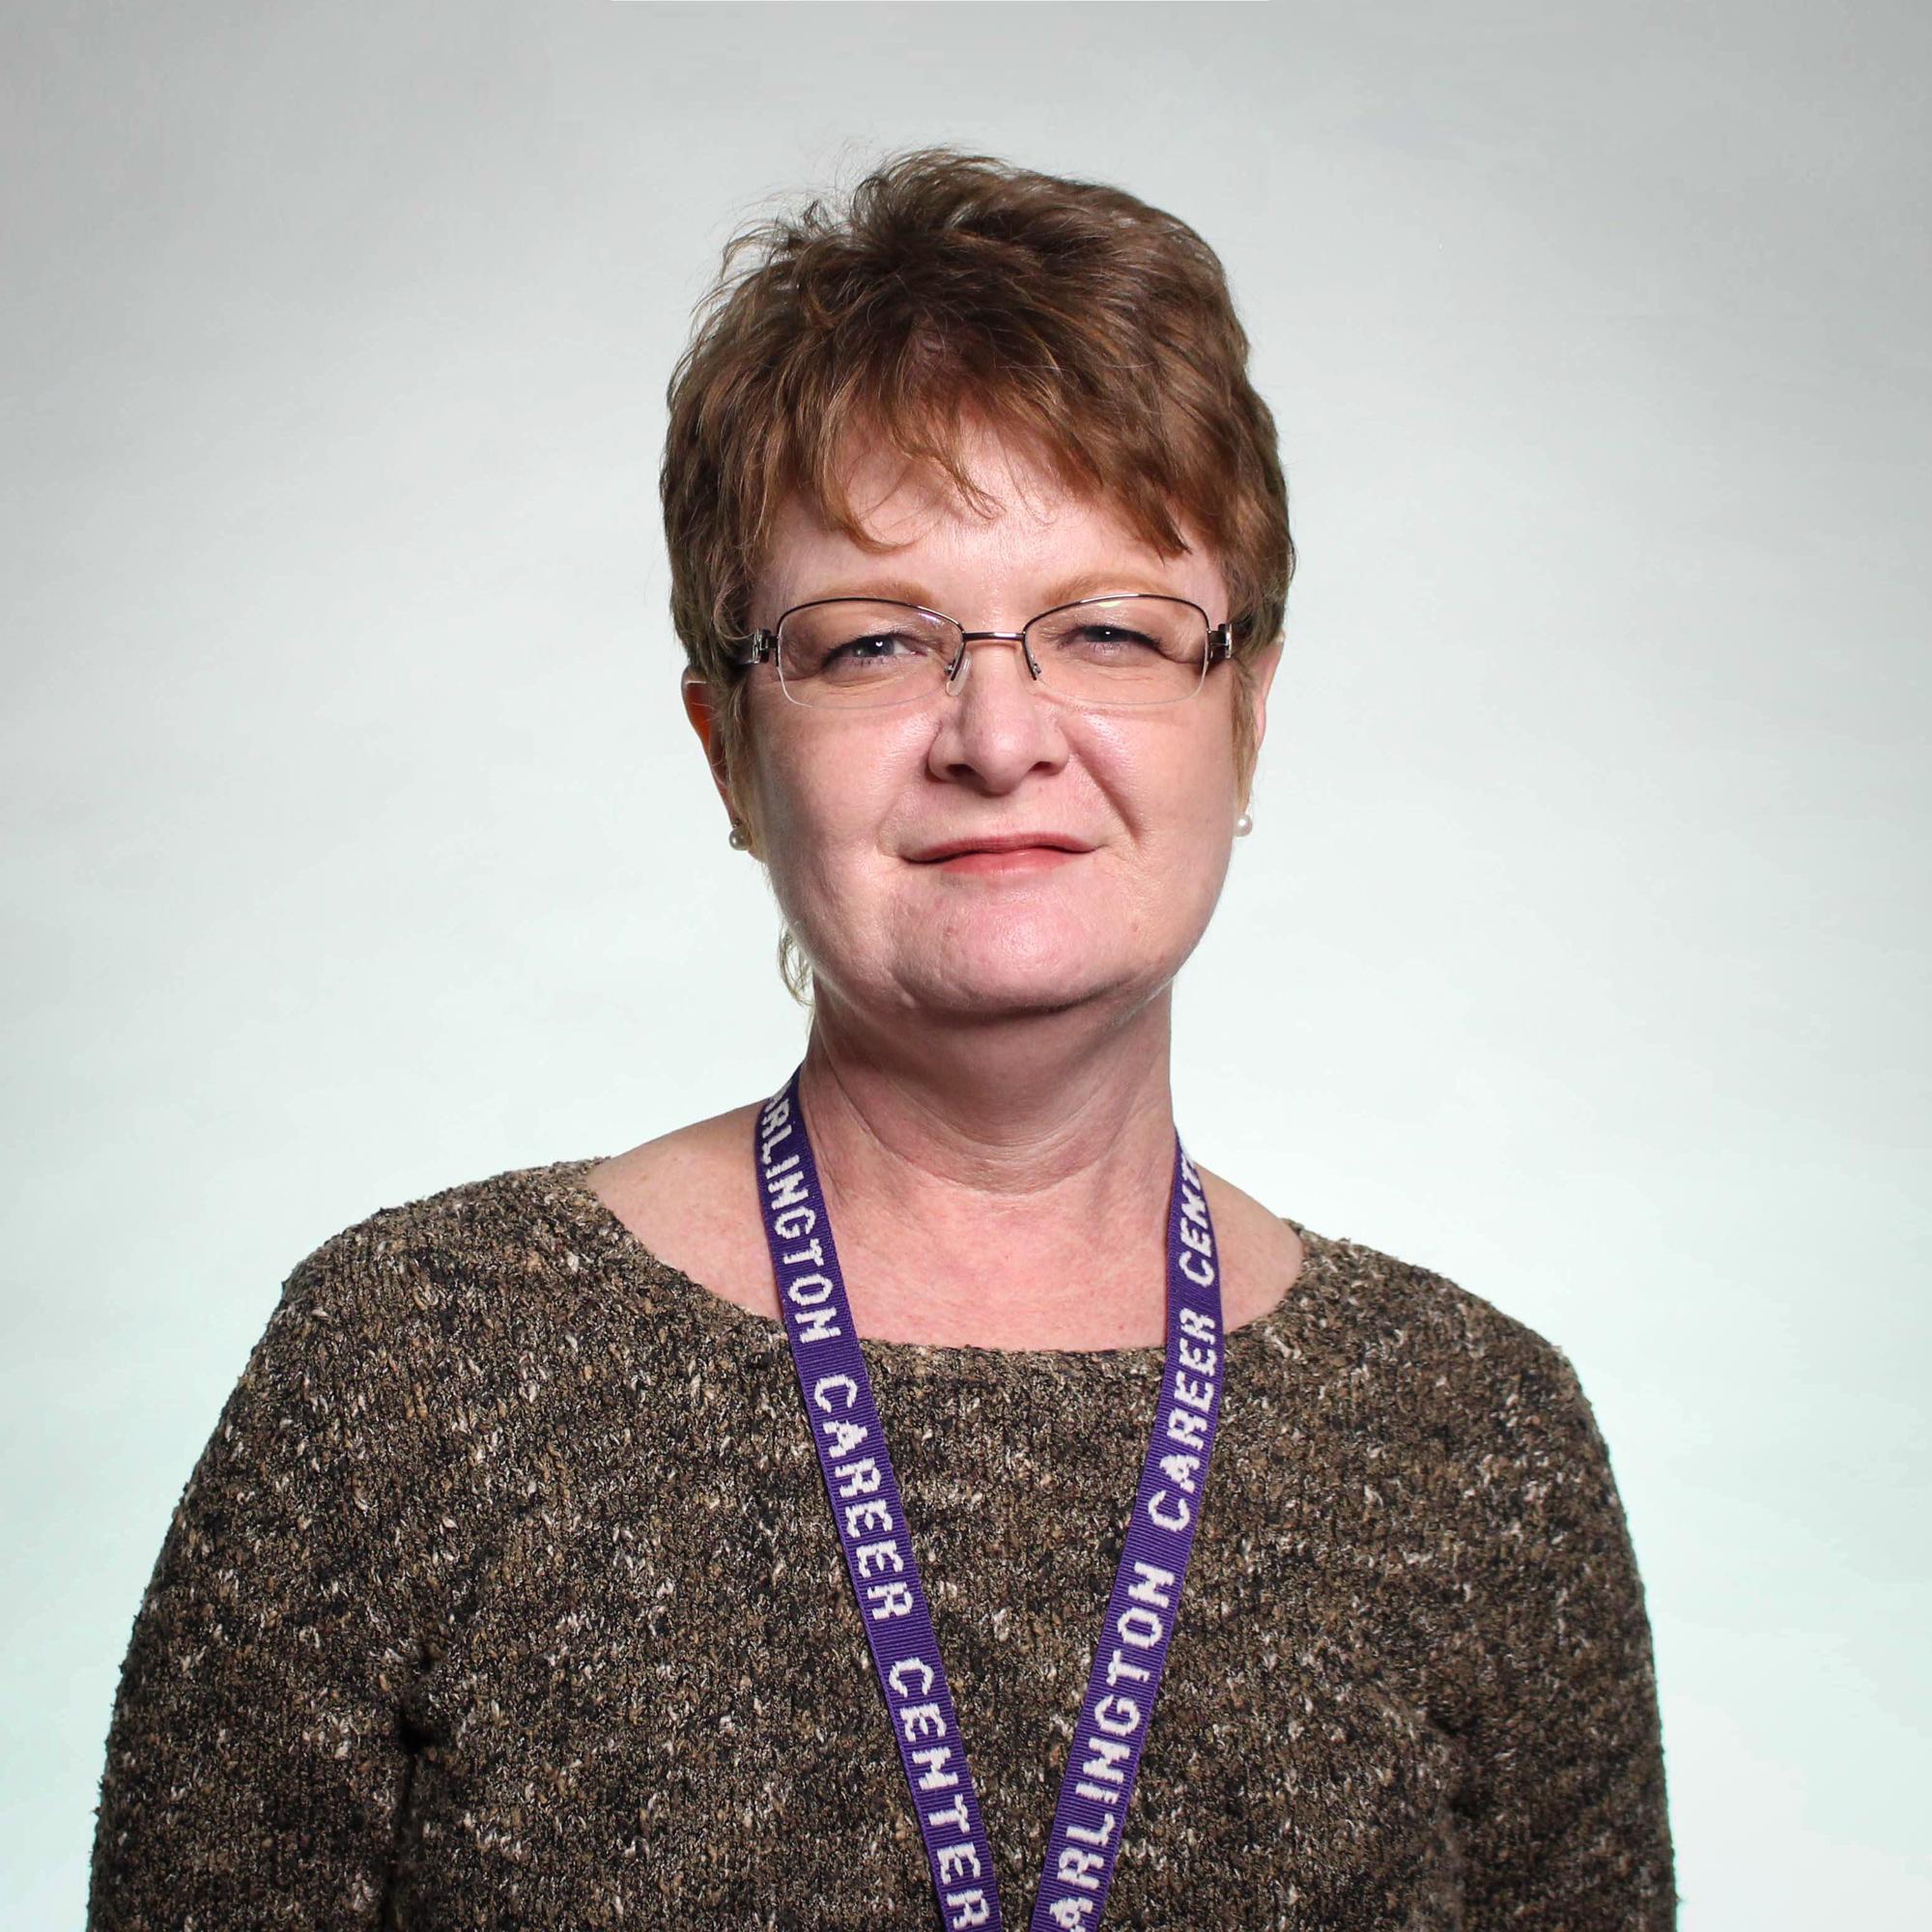 Ms. Julie Frye